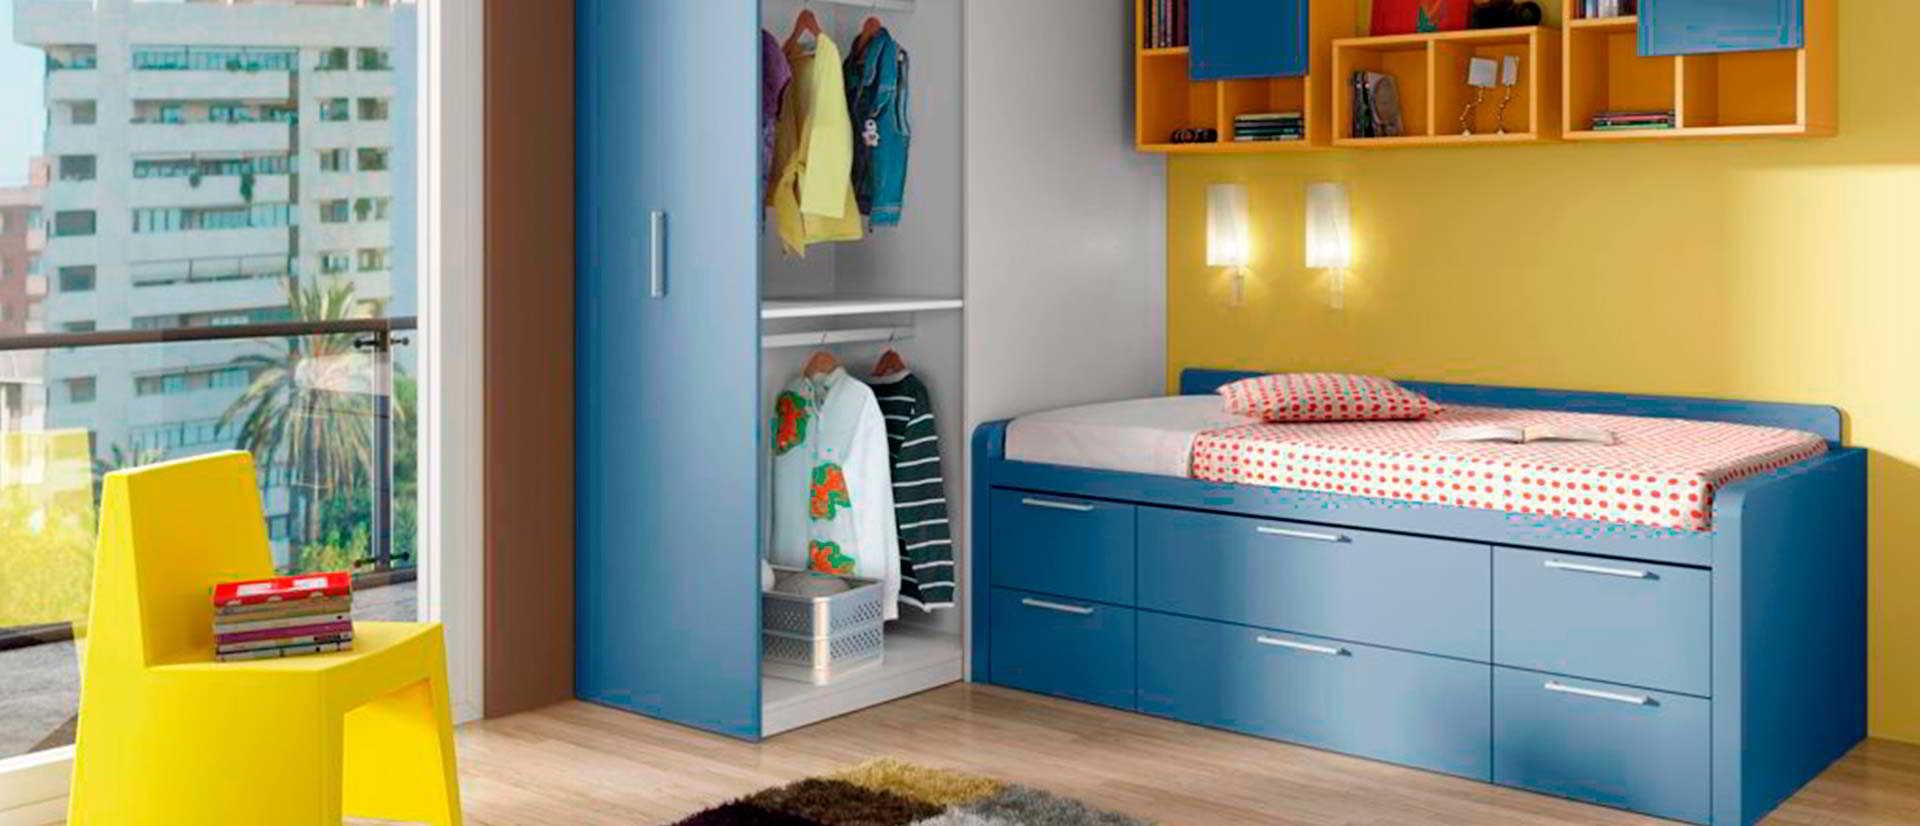 dormitorio infantil azul con cama nido